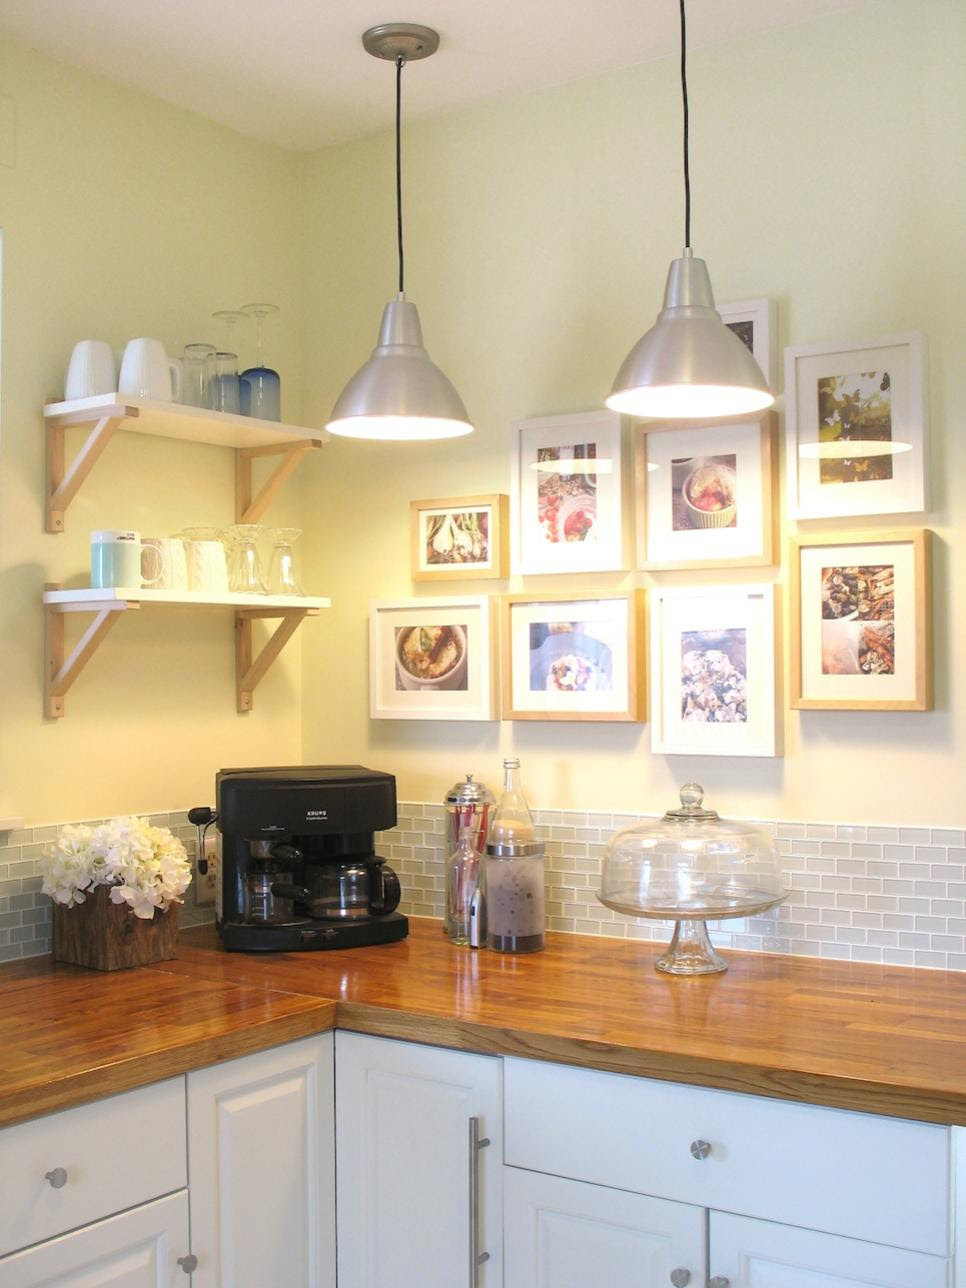 Painted Kitchen Cabinet Ideas | HGTV